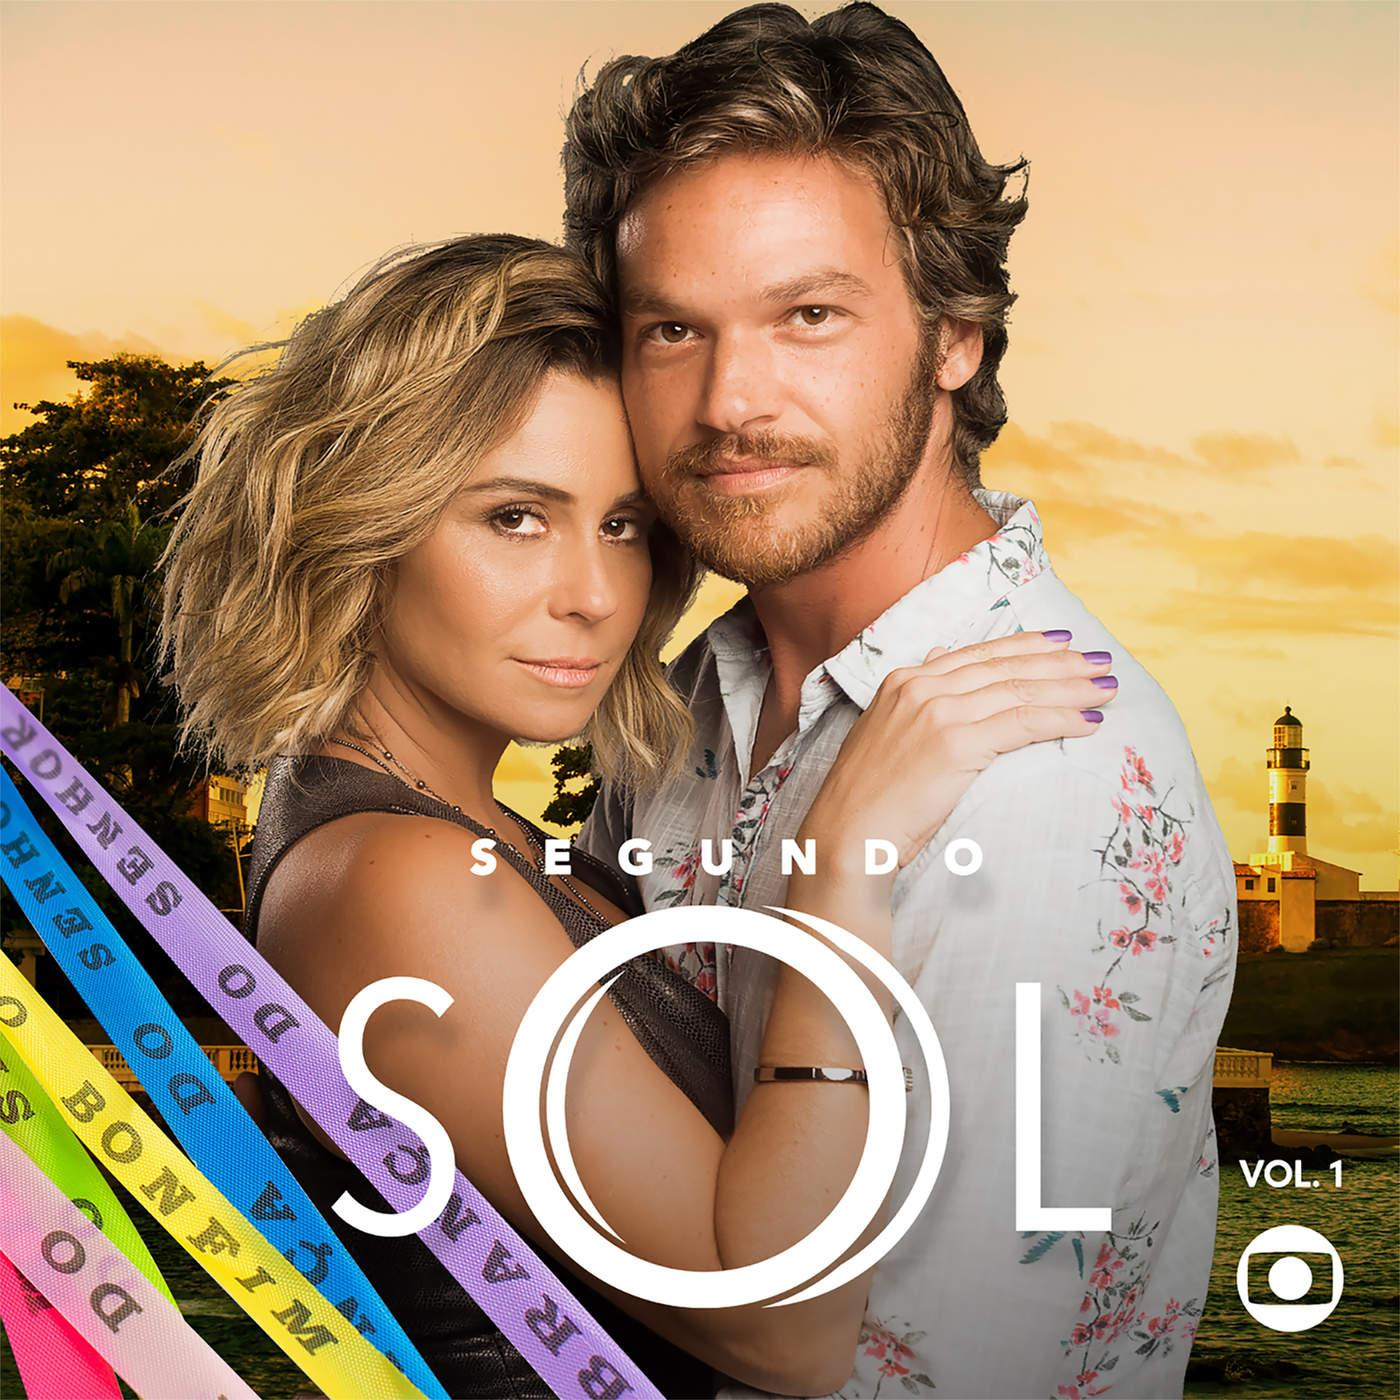 Avenida brasil capitulo 18 completo online dating